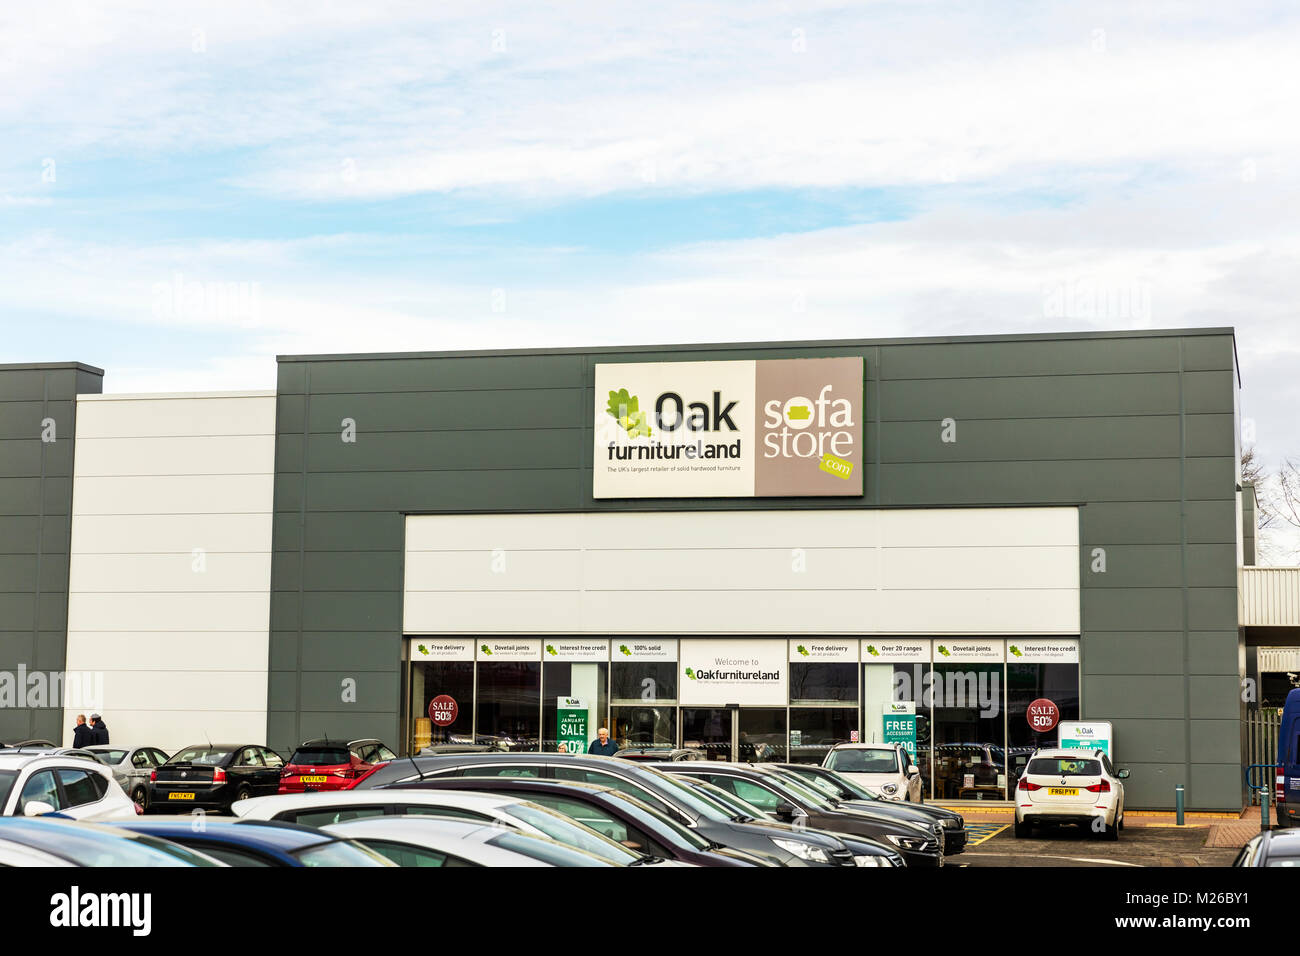 Oak Furnitureland Store Sign, Oak Furniture Land Store Sign, Oak Furniture  Store Sign,